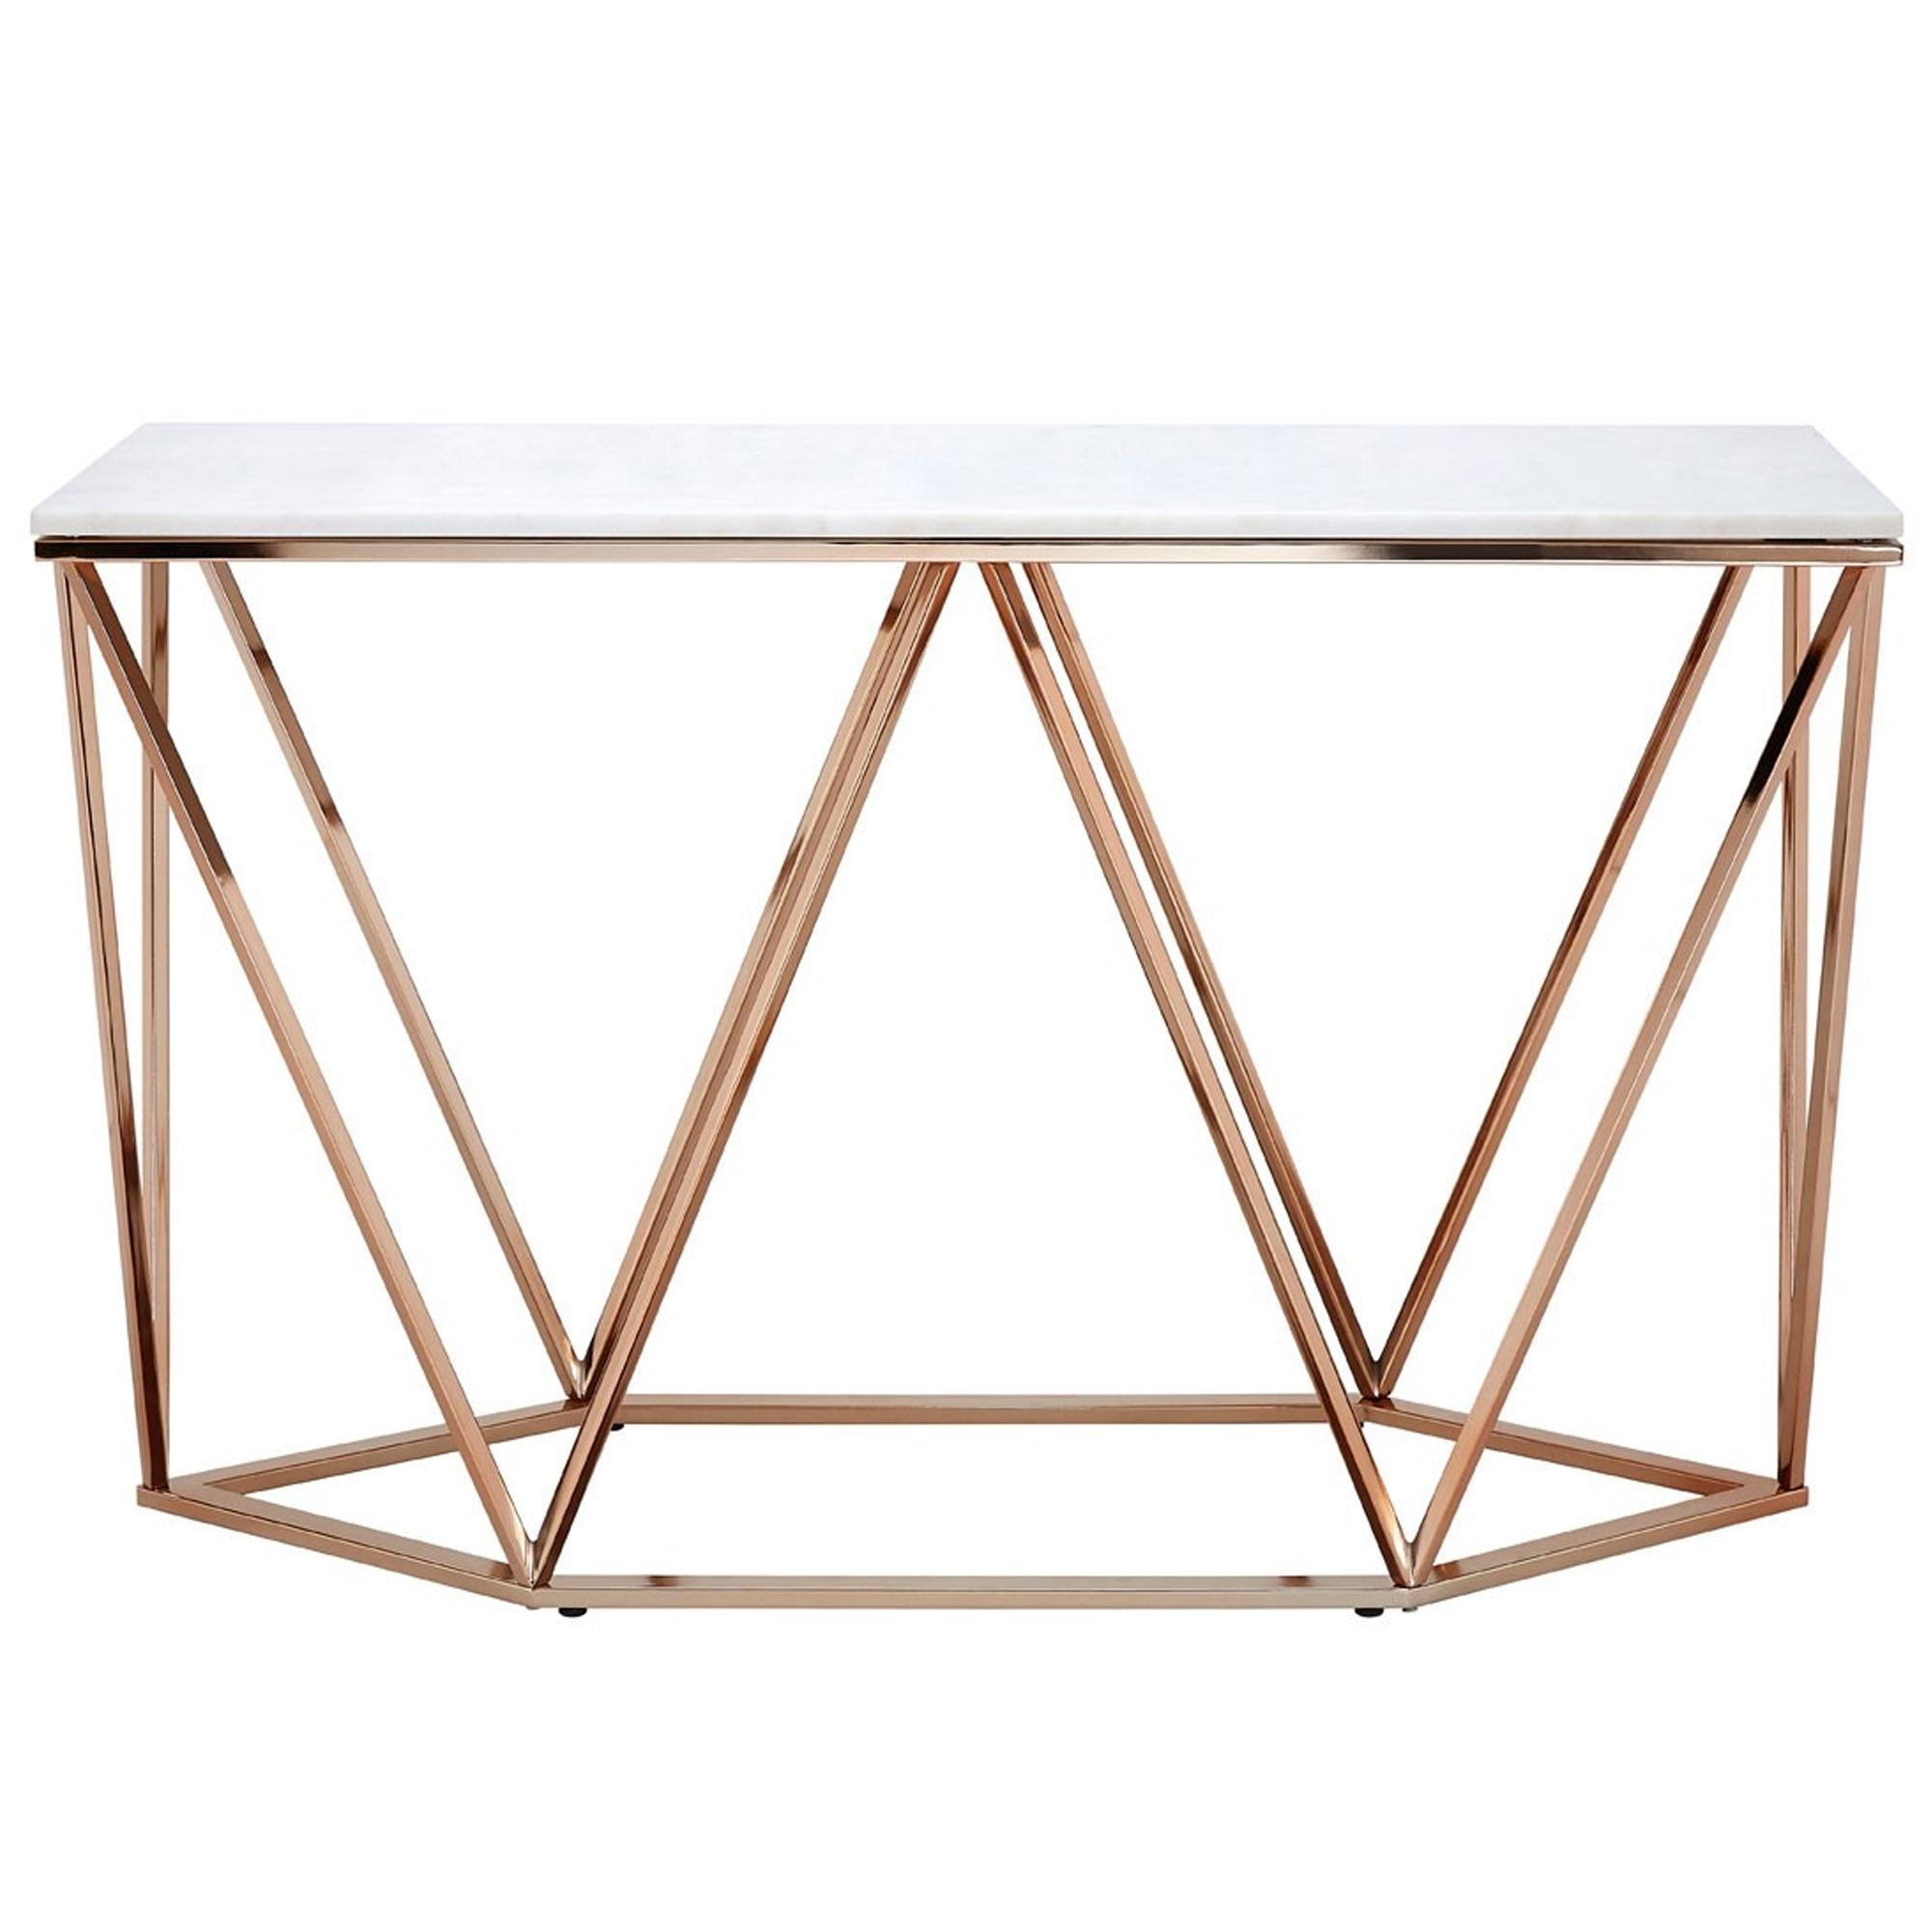 7c31581b2cbd95 Allure Rectangular Console Table | Modern Lounge Furniture